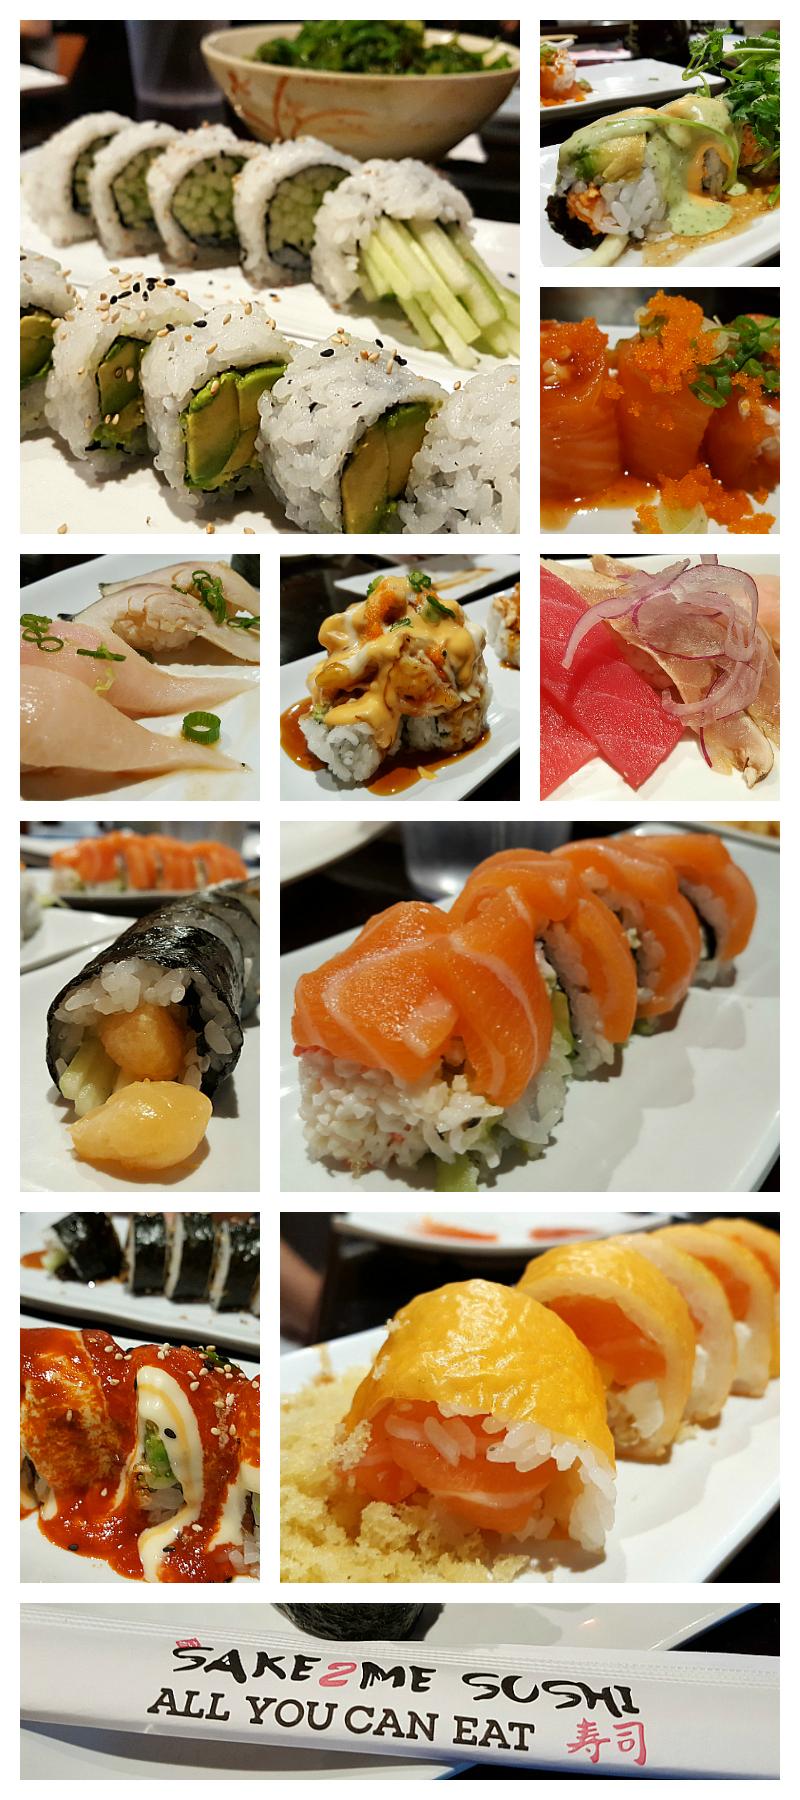 Sake2Me All You Can Eat Sushi in Tustin